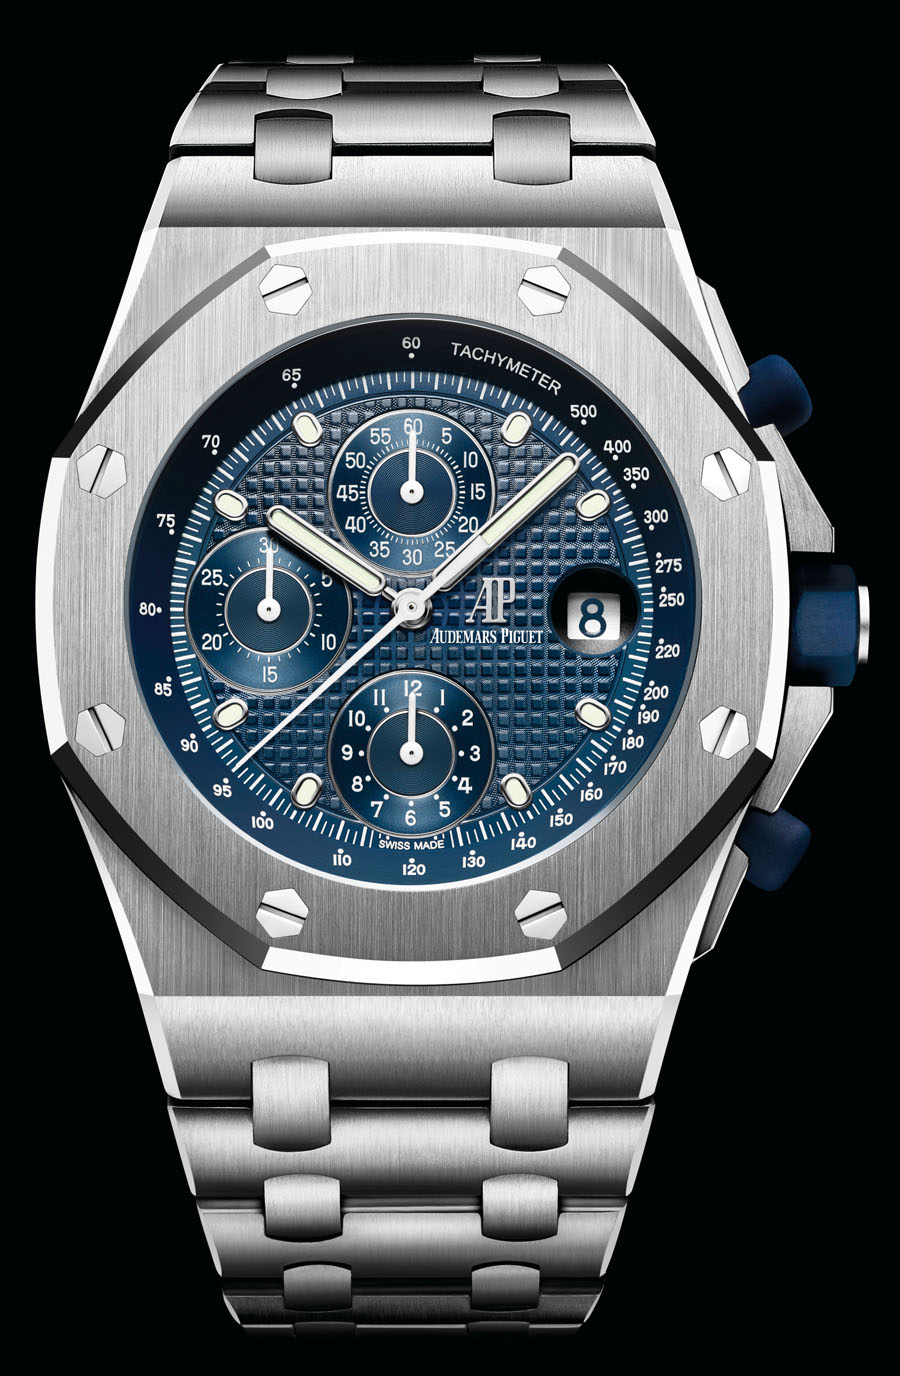 Platz 8 der beliebtesten Uhrenmodelle 2017: Audemars Piguet: Royal Oak Offshore Chronograph